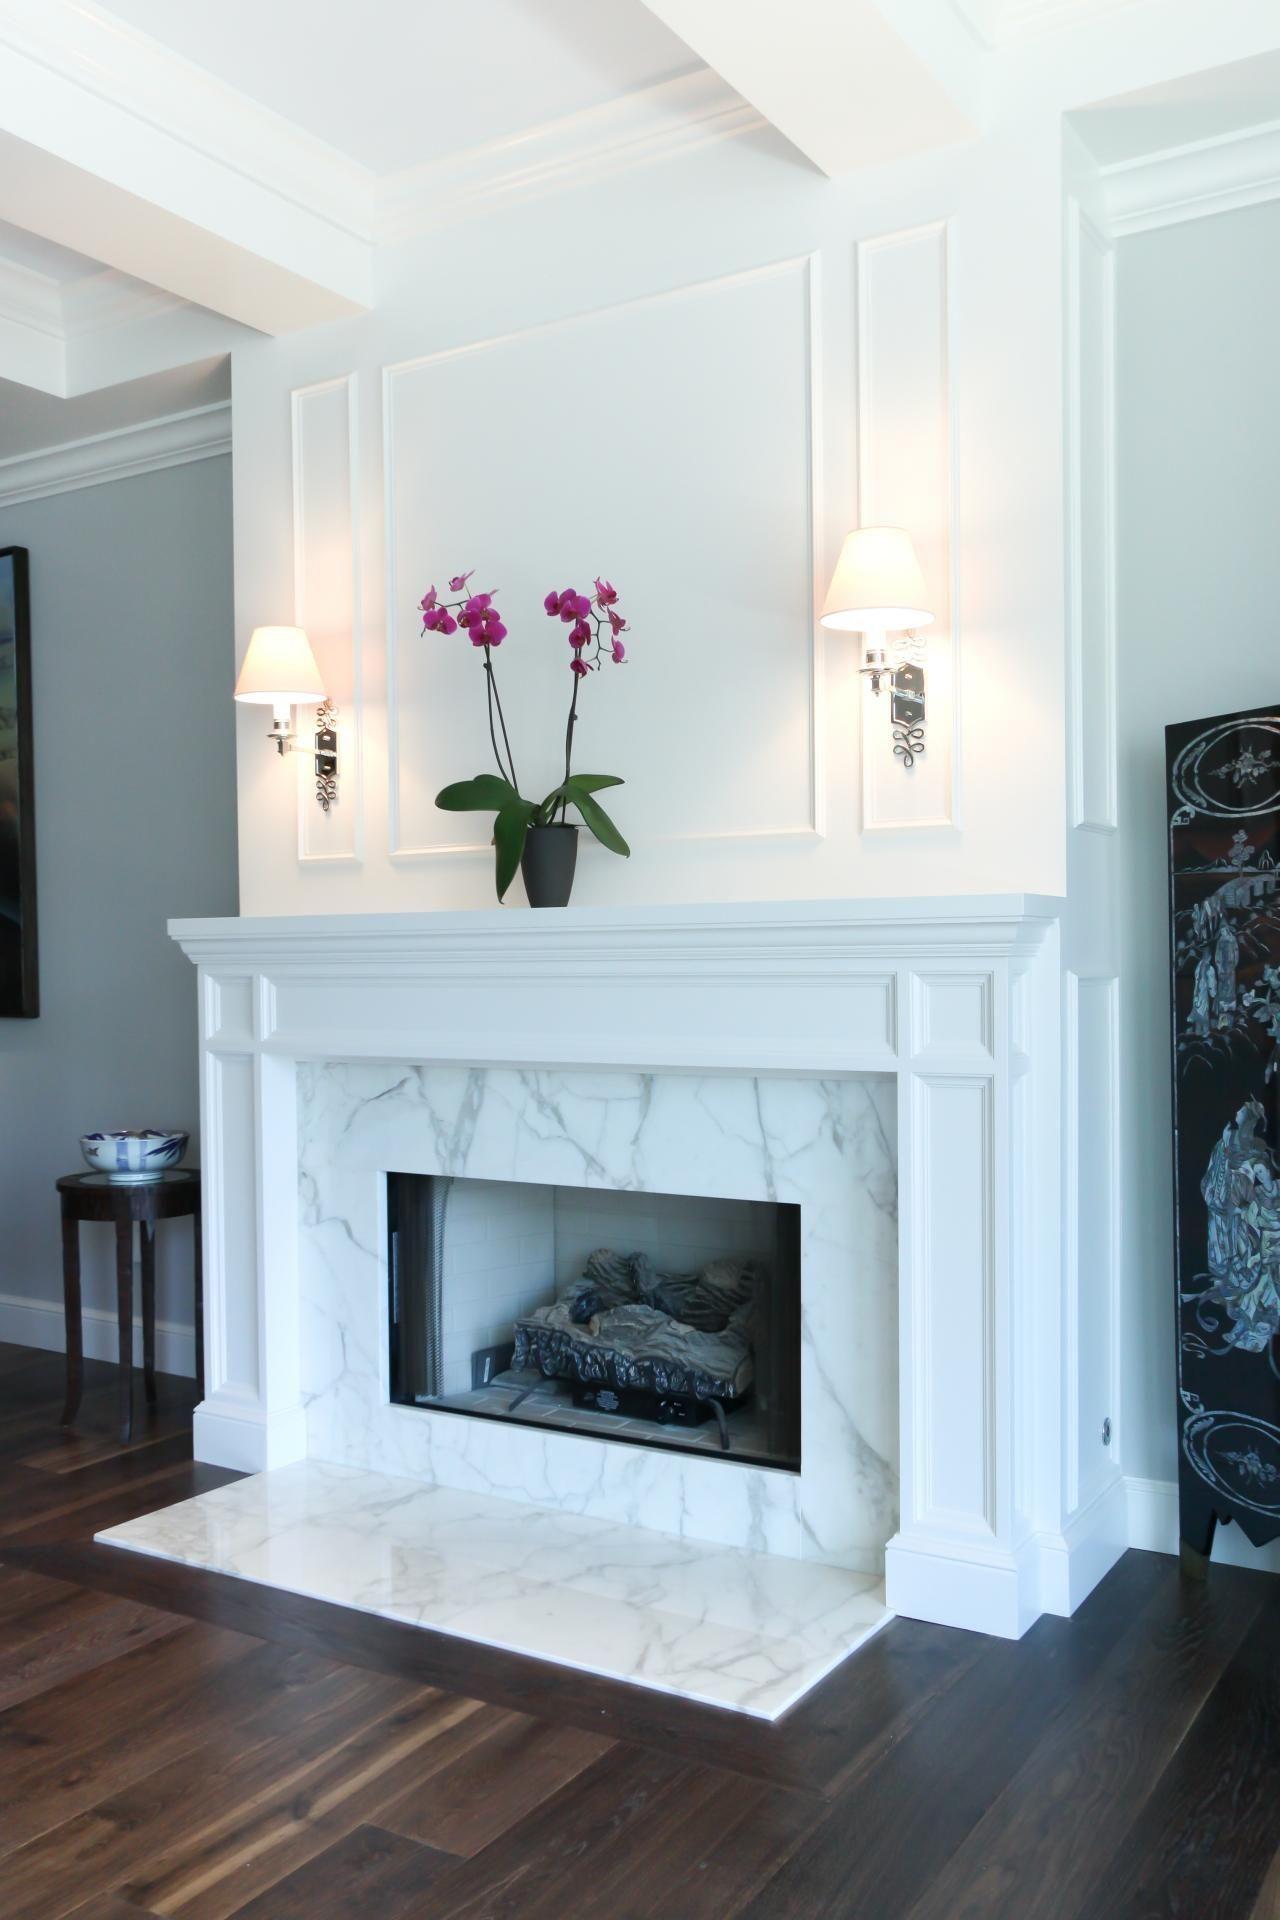 fireplace fascia ideas 27 stunning fireplace tile ideas for your rh pinterest co uk